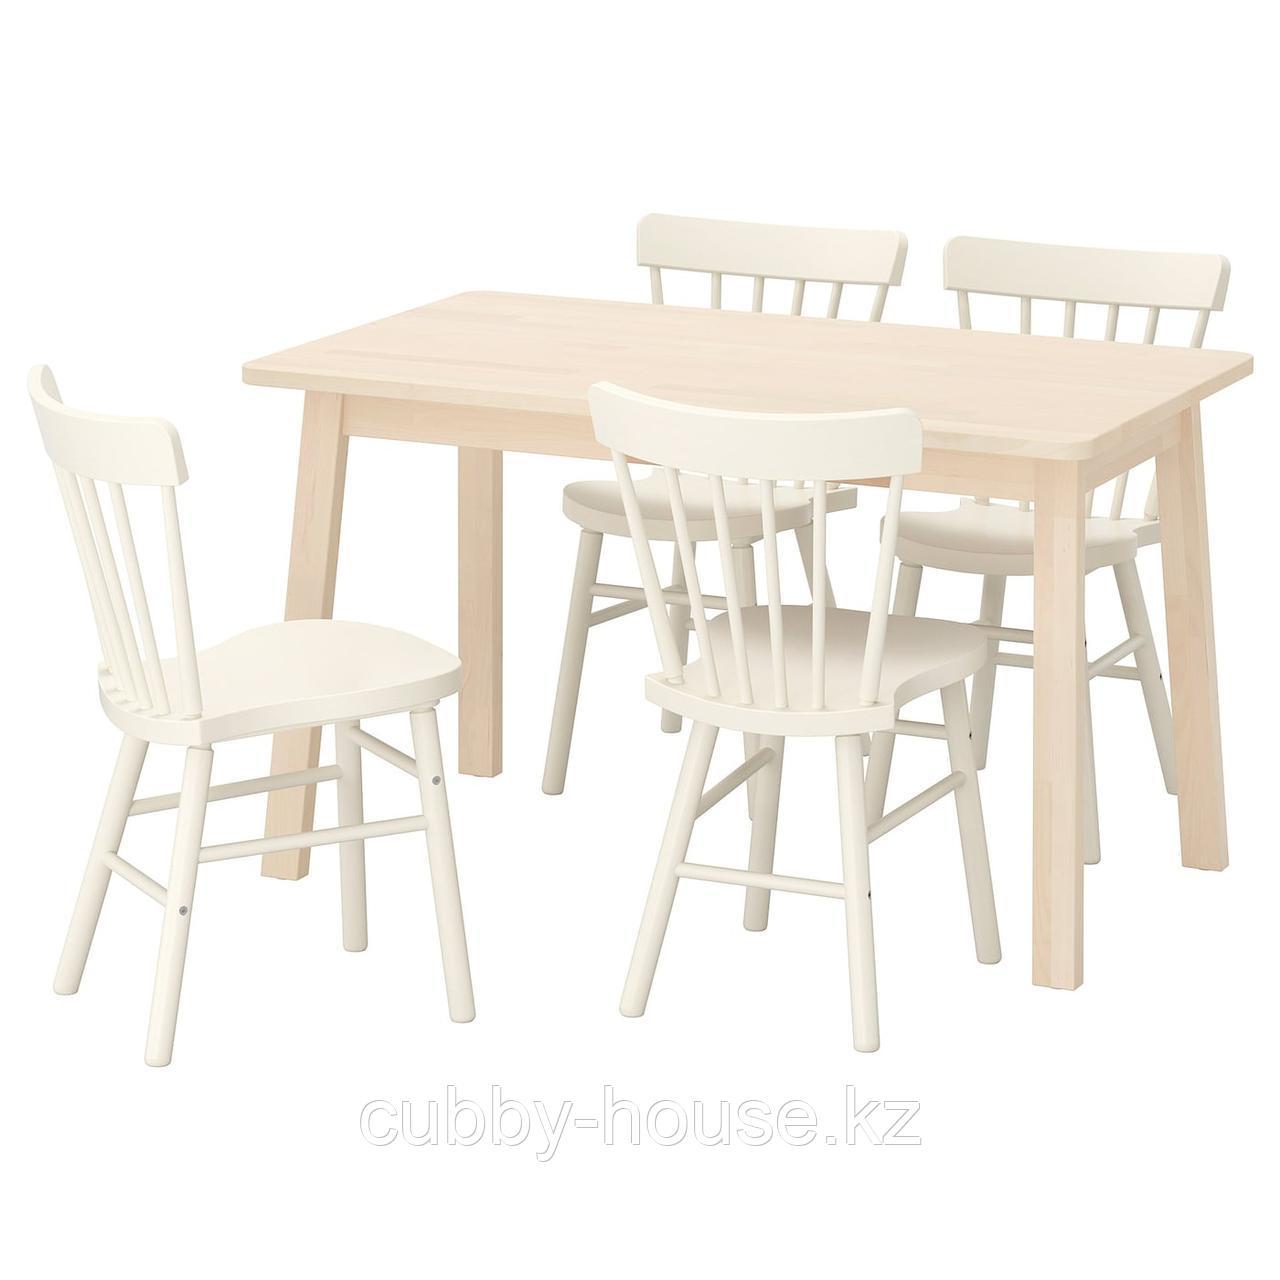 НОРРОКЕР / НОРРАРИД Стол и 4 стула, береза белый, 125x74 см